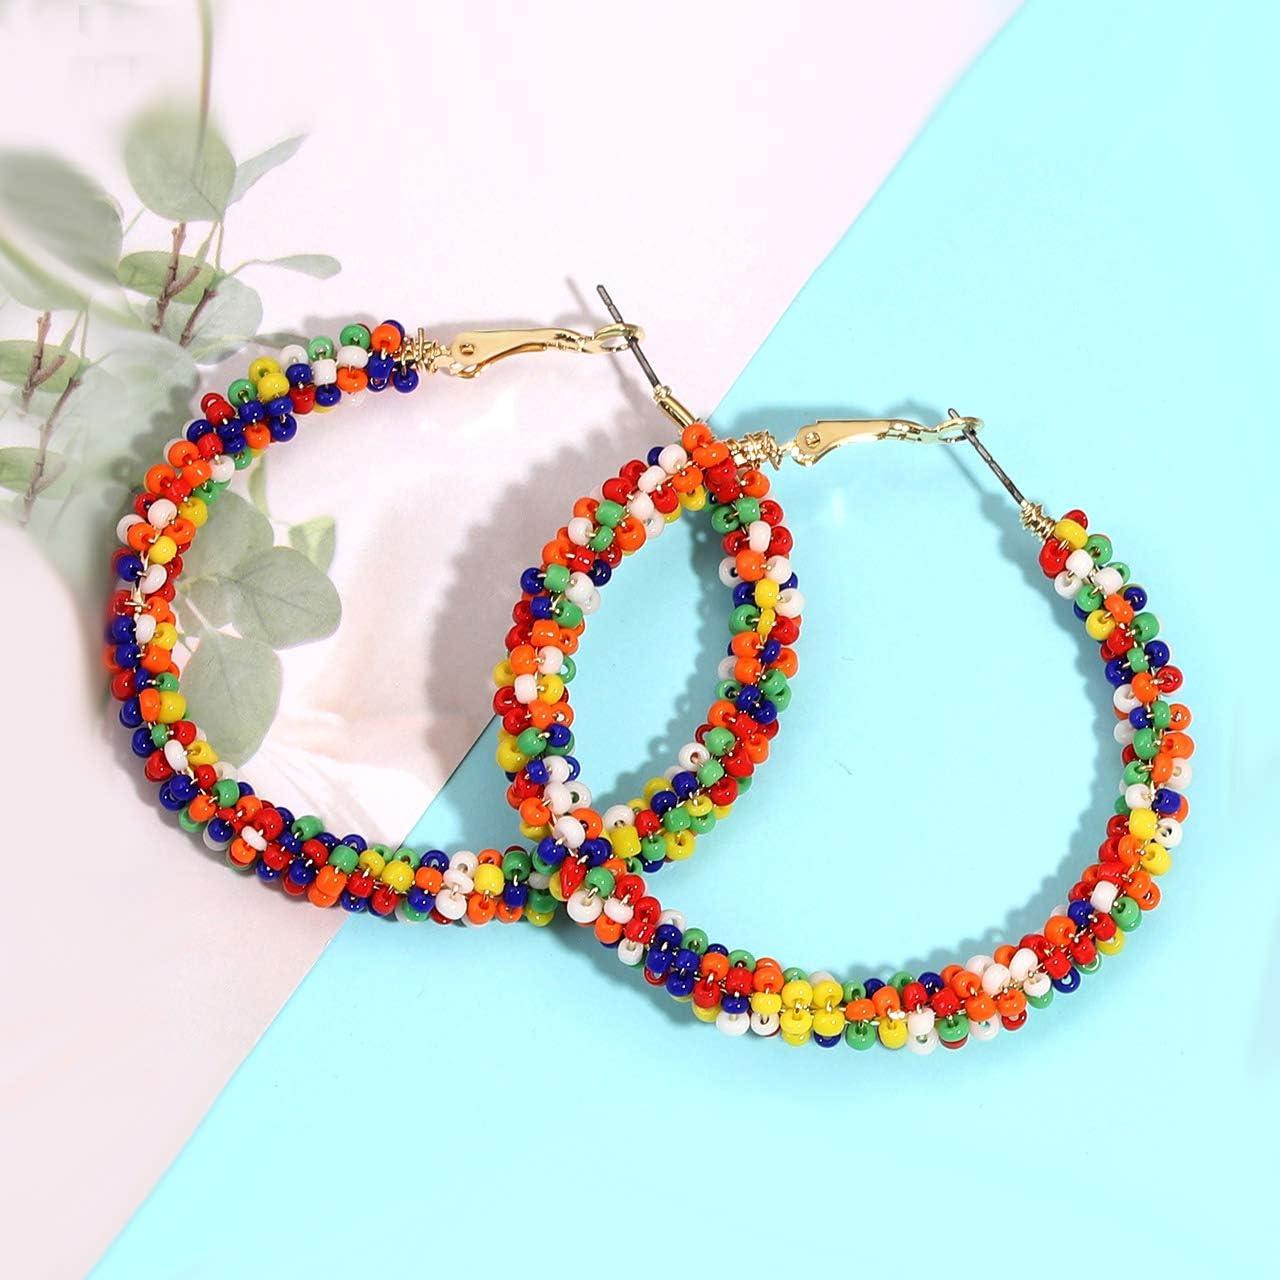 CEALXHENY Beaded Hoop Earrings for Women Mixed Color Bead Dangle Earrings Bohemia Hoop Dangle Earring Studs for Girls